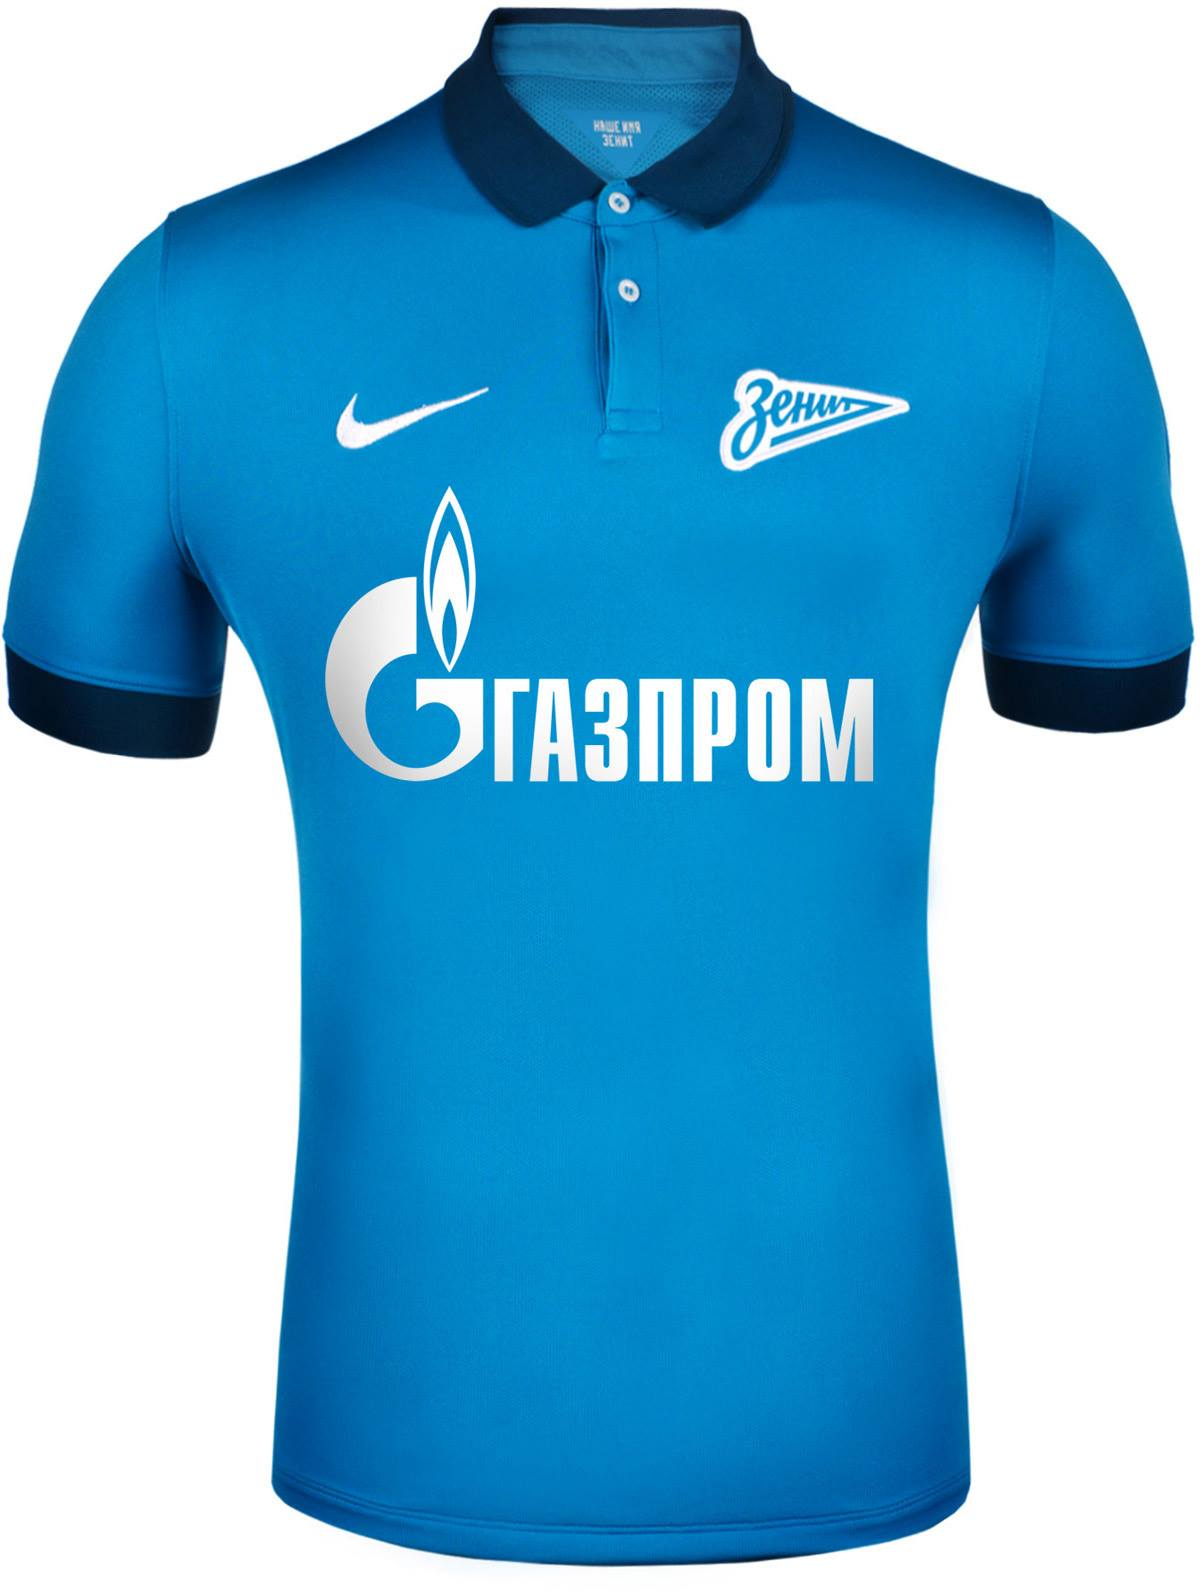 New Nike Zenit 14-15 Kits Released